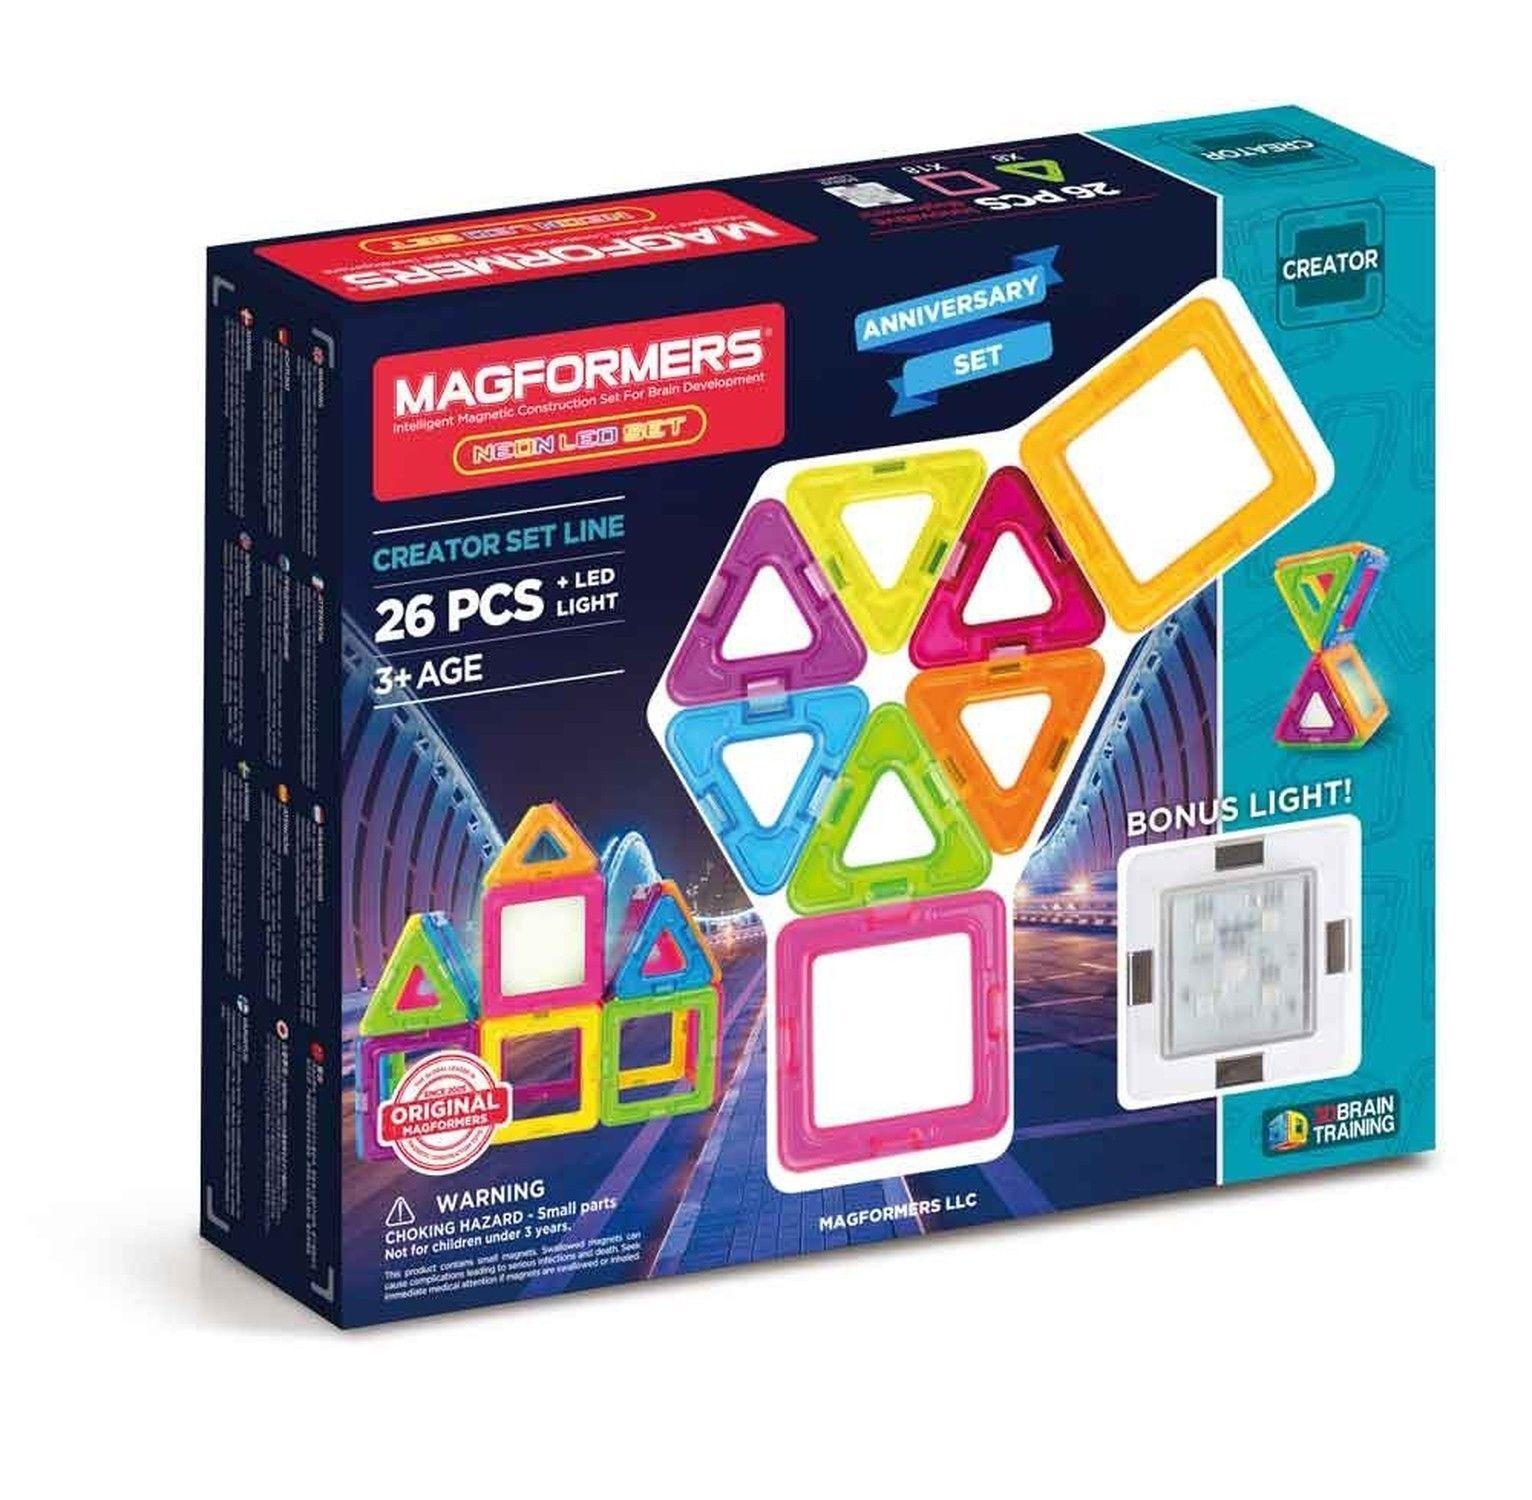 MAGFORMERS Neon (26 Piece) + Bonus Light Building Set Rainbow